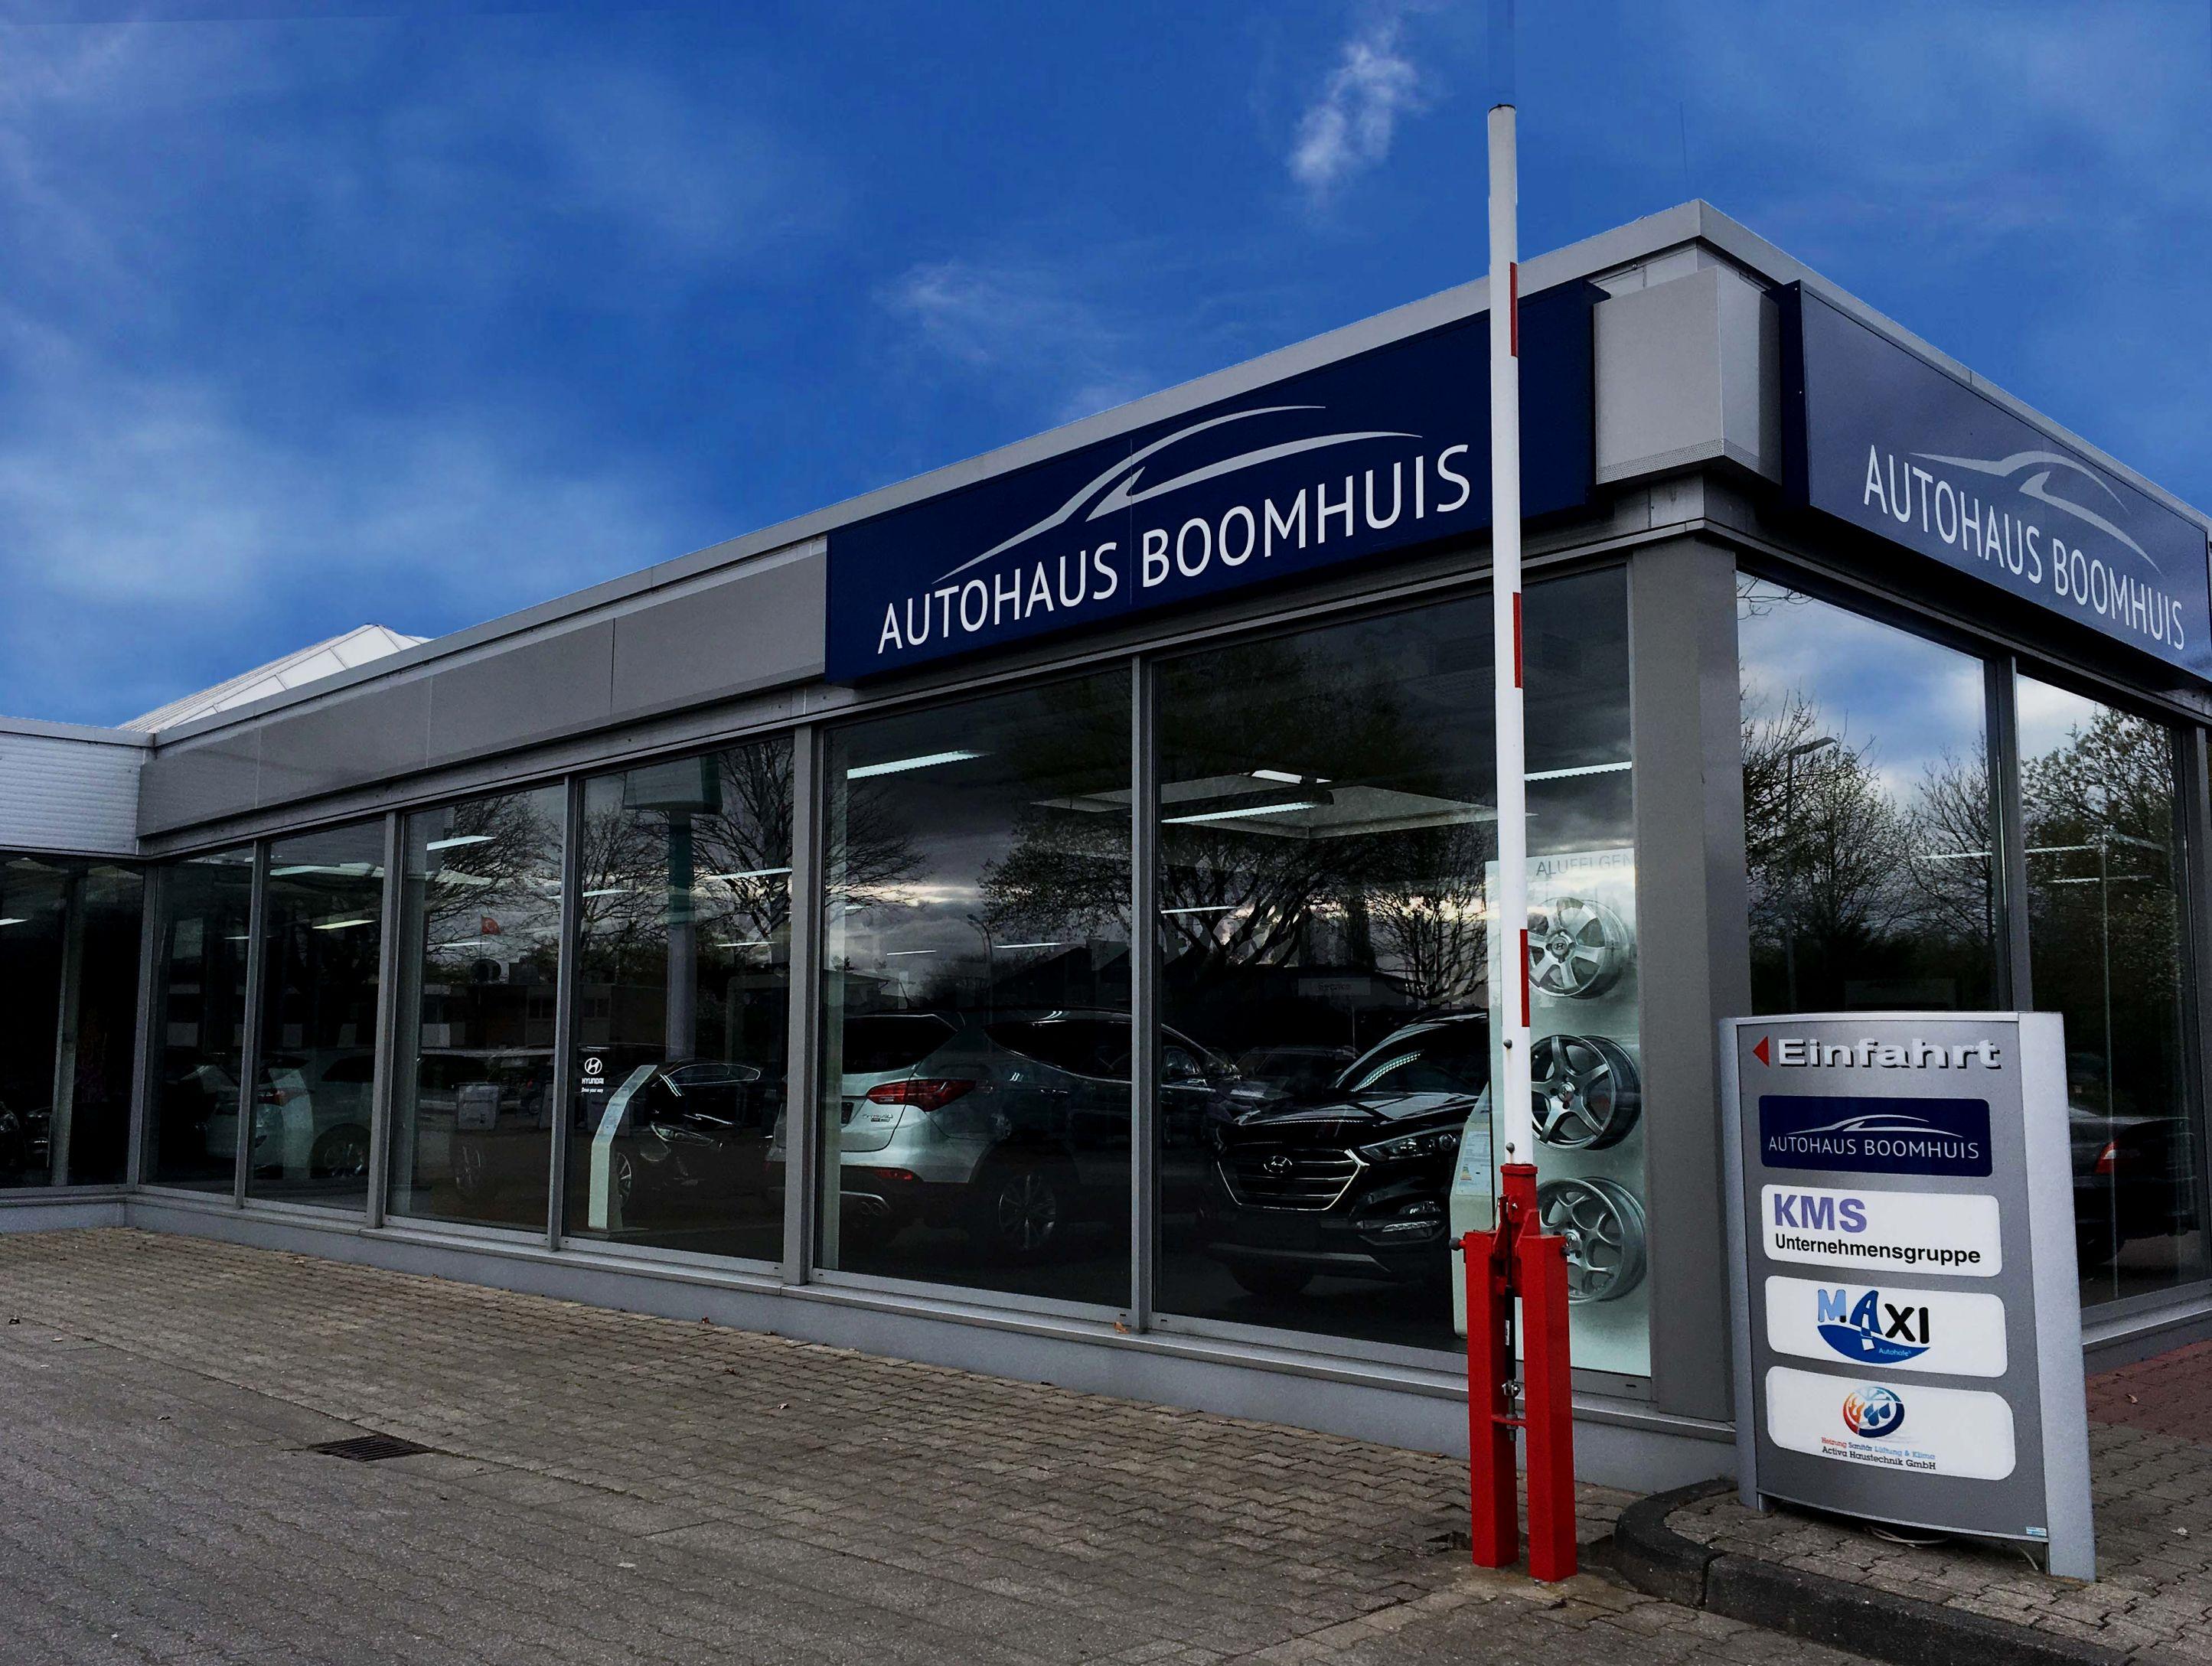 Autohaus Boomhuis